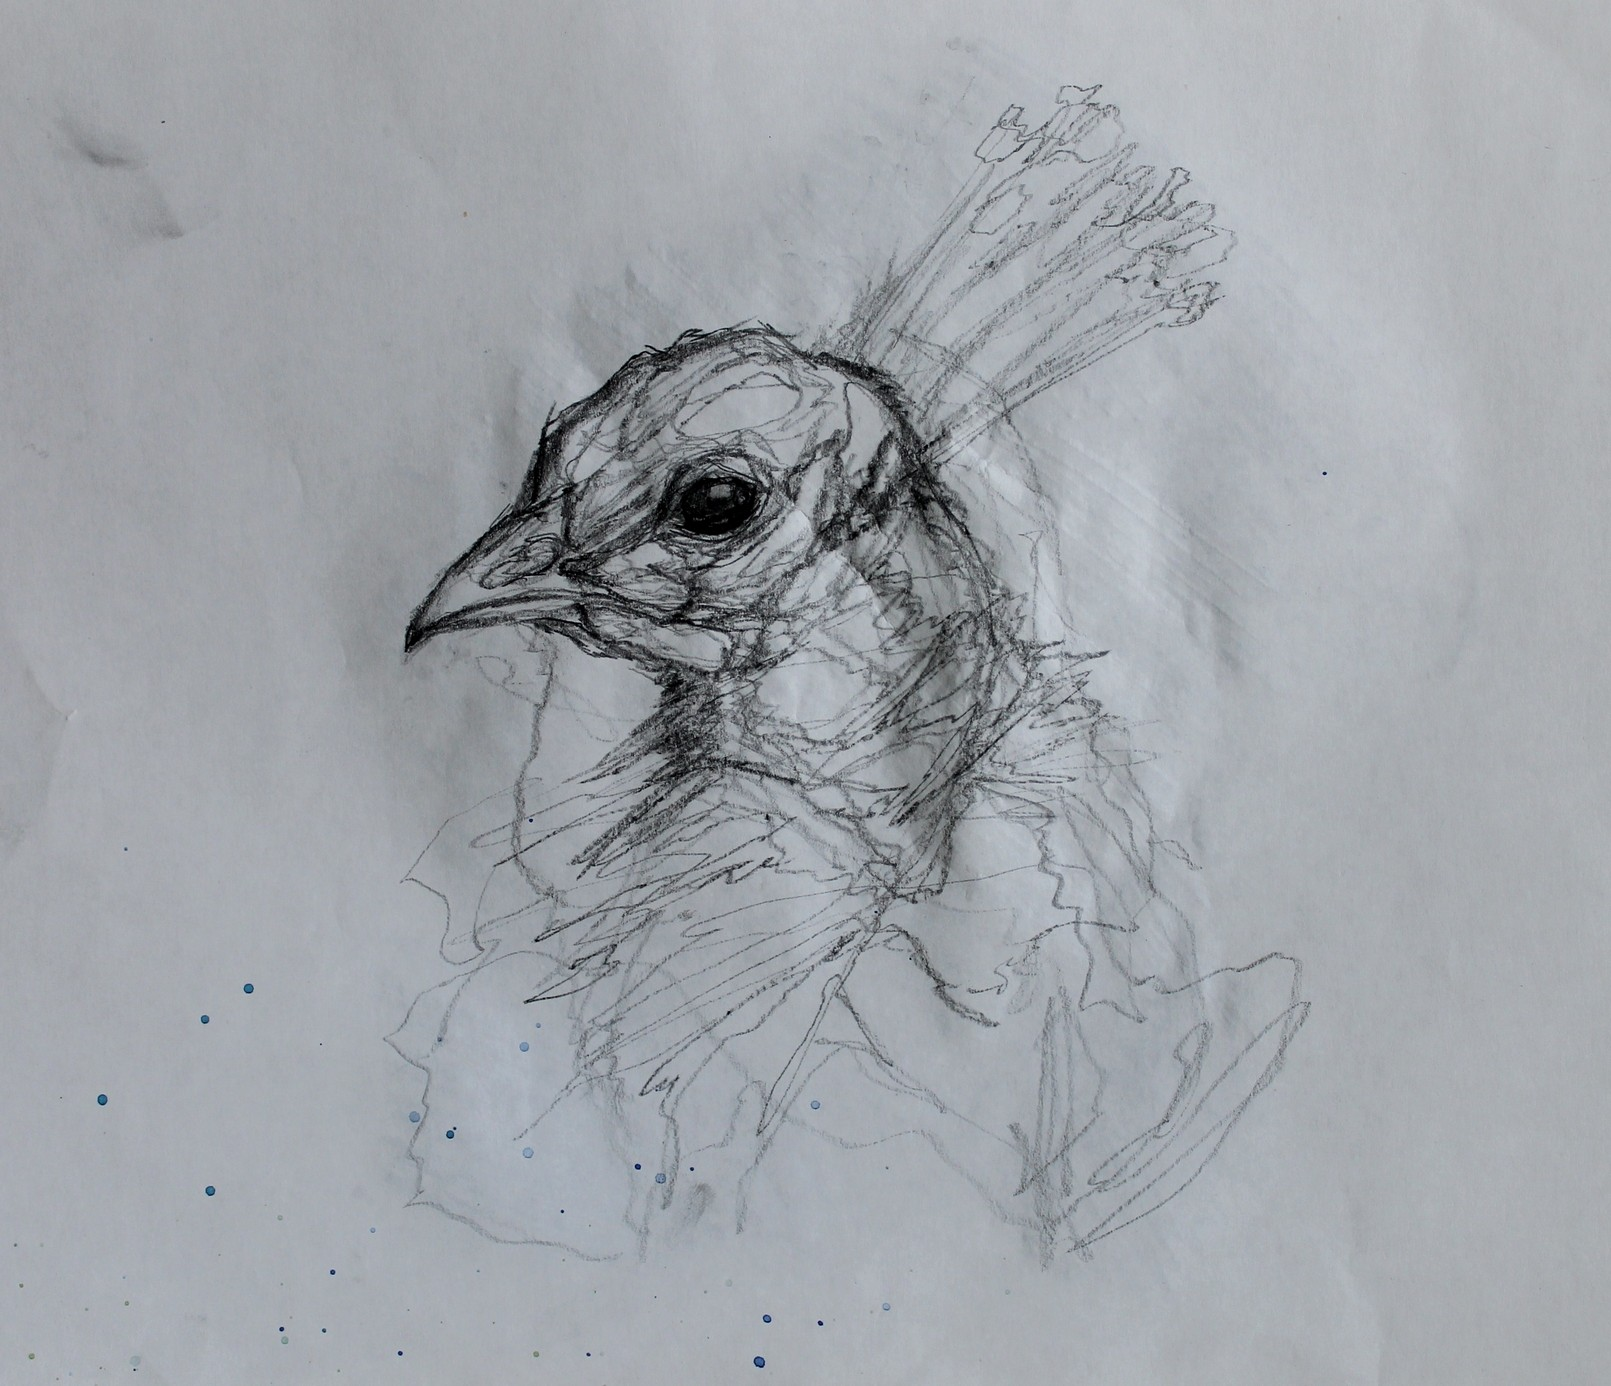 peacock4.jpg